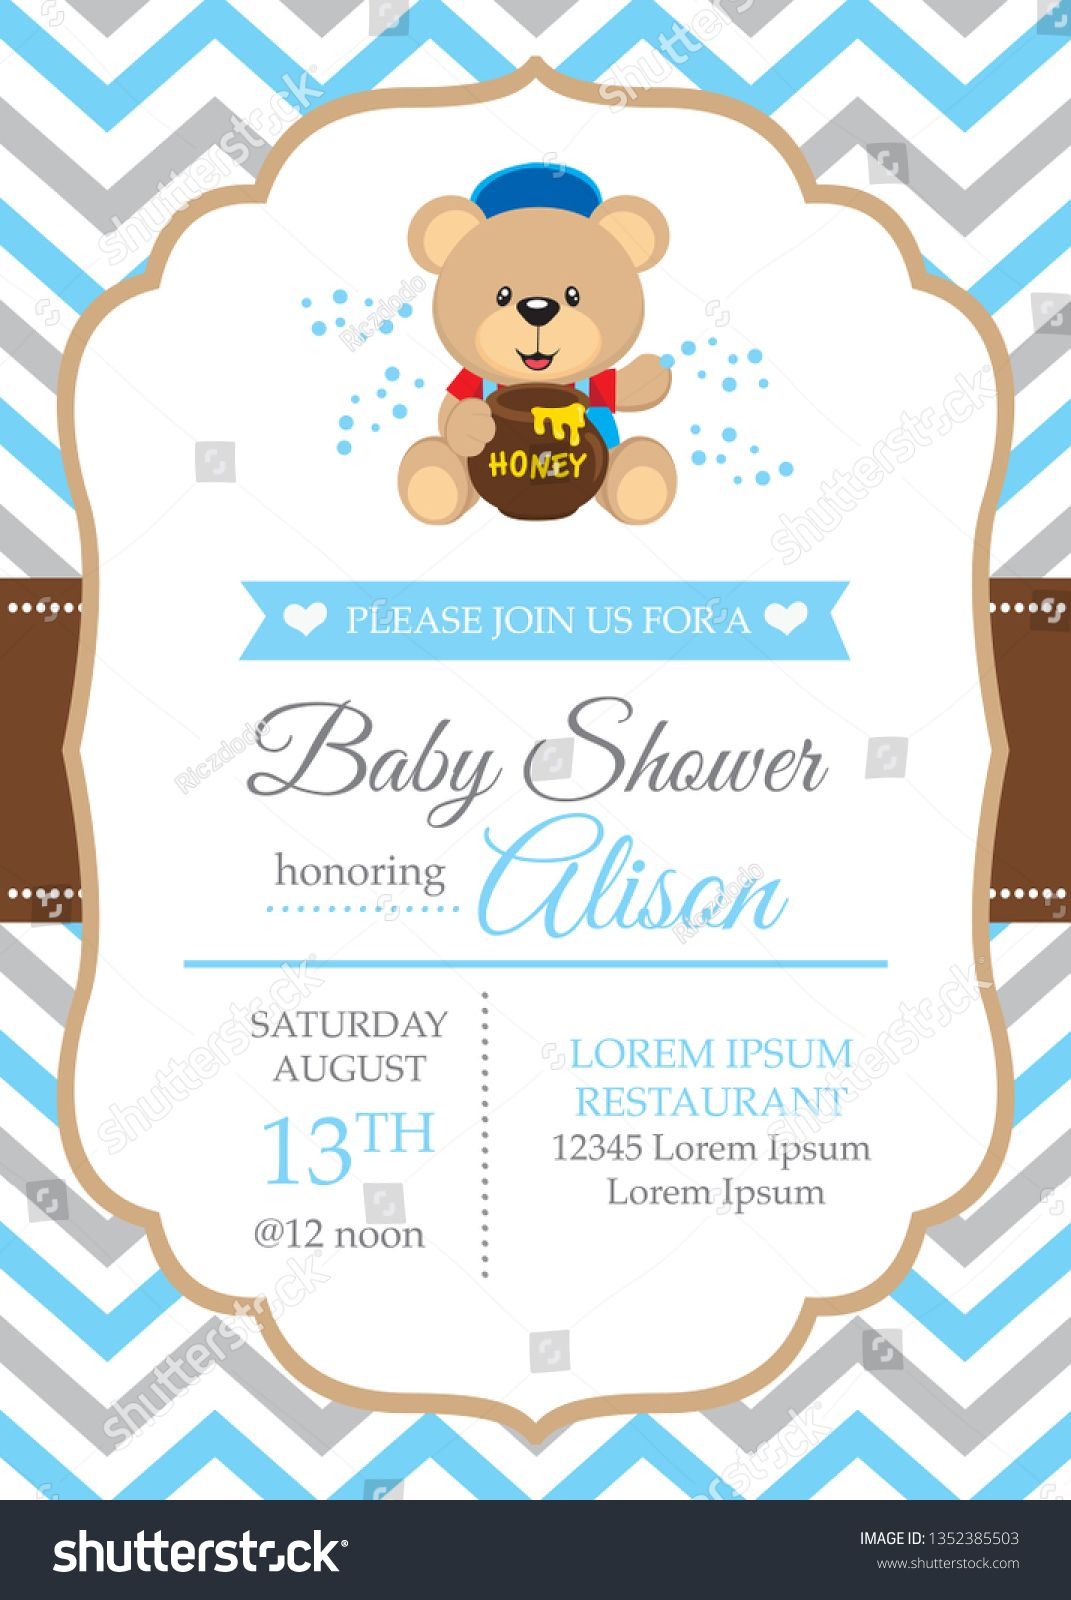 Beautiful baby boy shower card with cute bear. #babyshower #blue